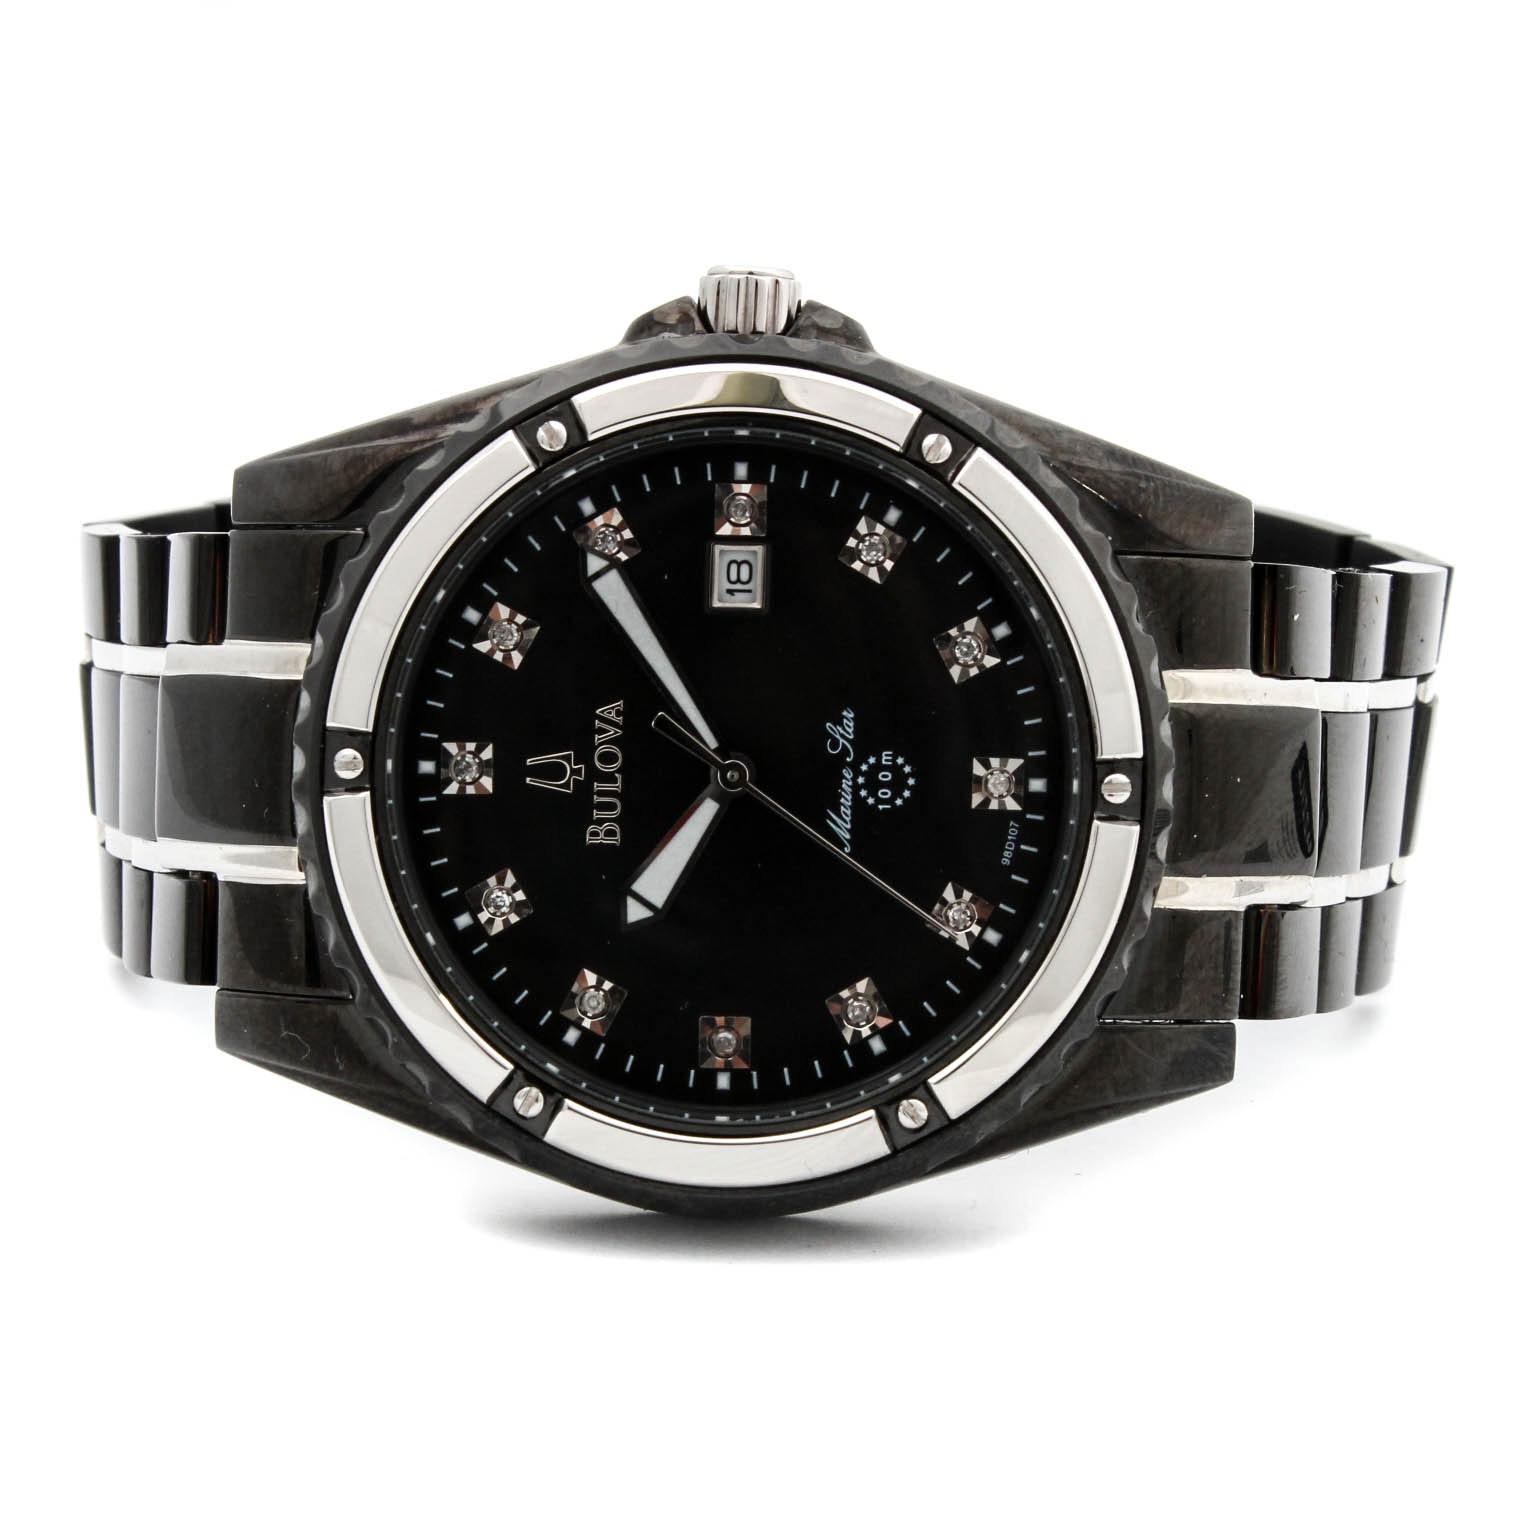 Bulova Marine Star Diamond Accented Stainless Steel Quartz Movement Wristwatch